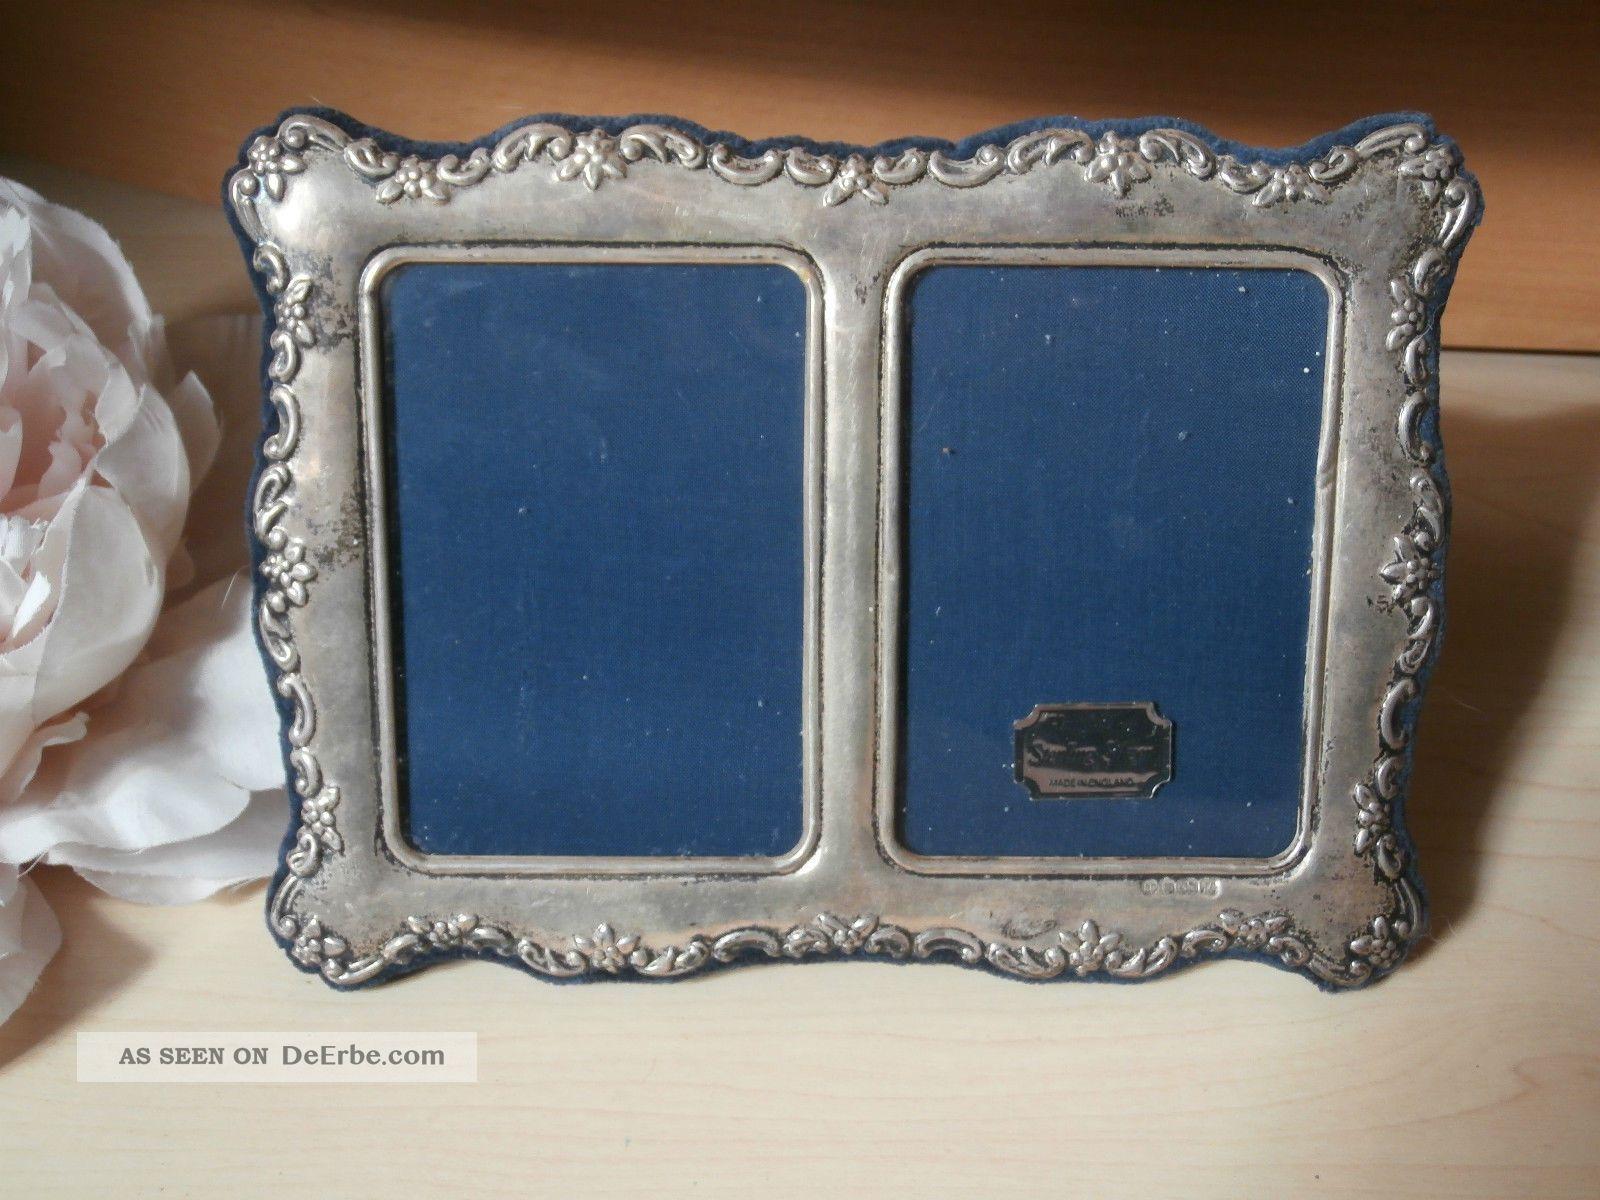 Großzügig Triple Silber Fotorahmen Bilder - Benutzerdefinierte ...